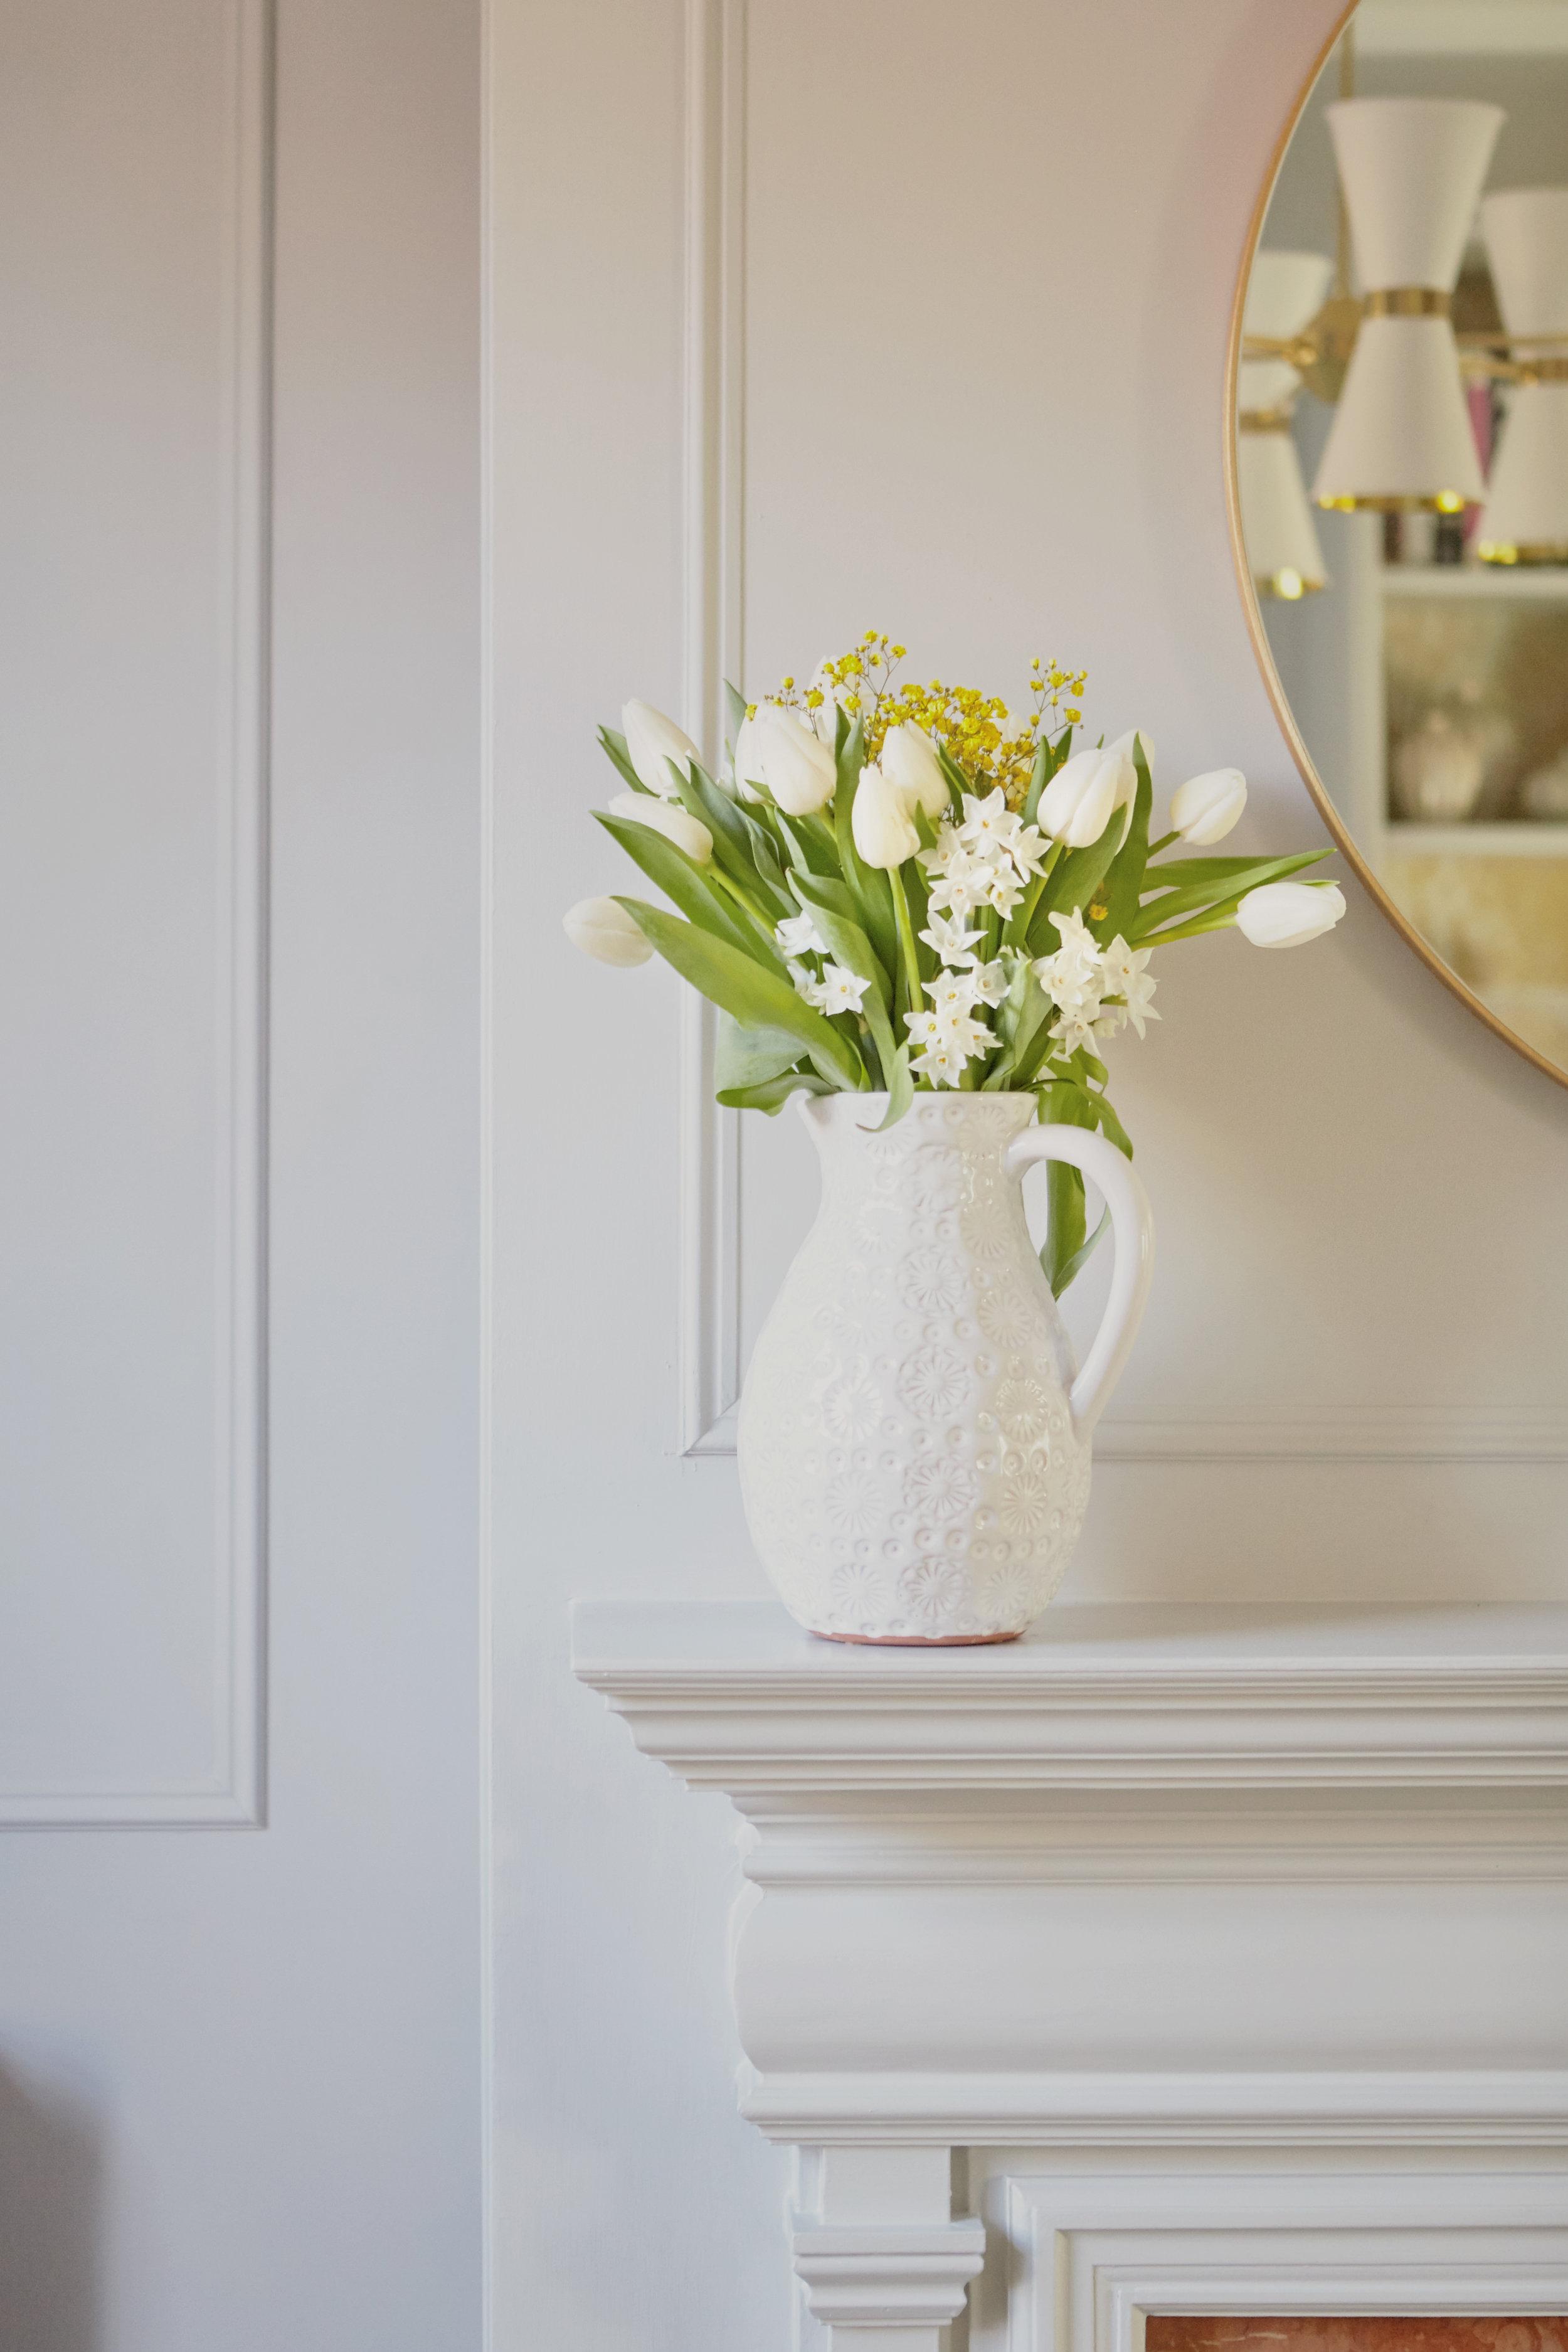 Melanie_Lissack_M&S_Flowers_024_Review.jpg